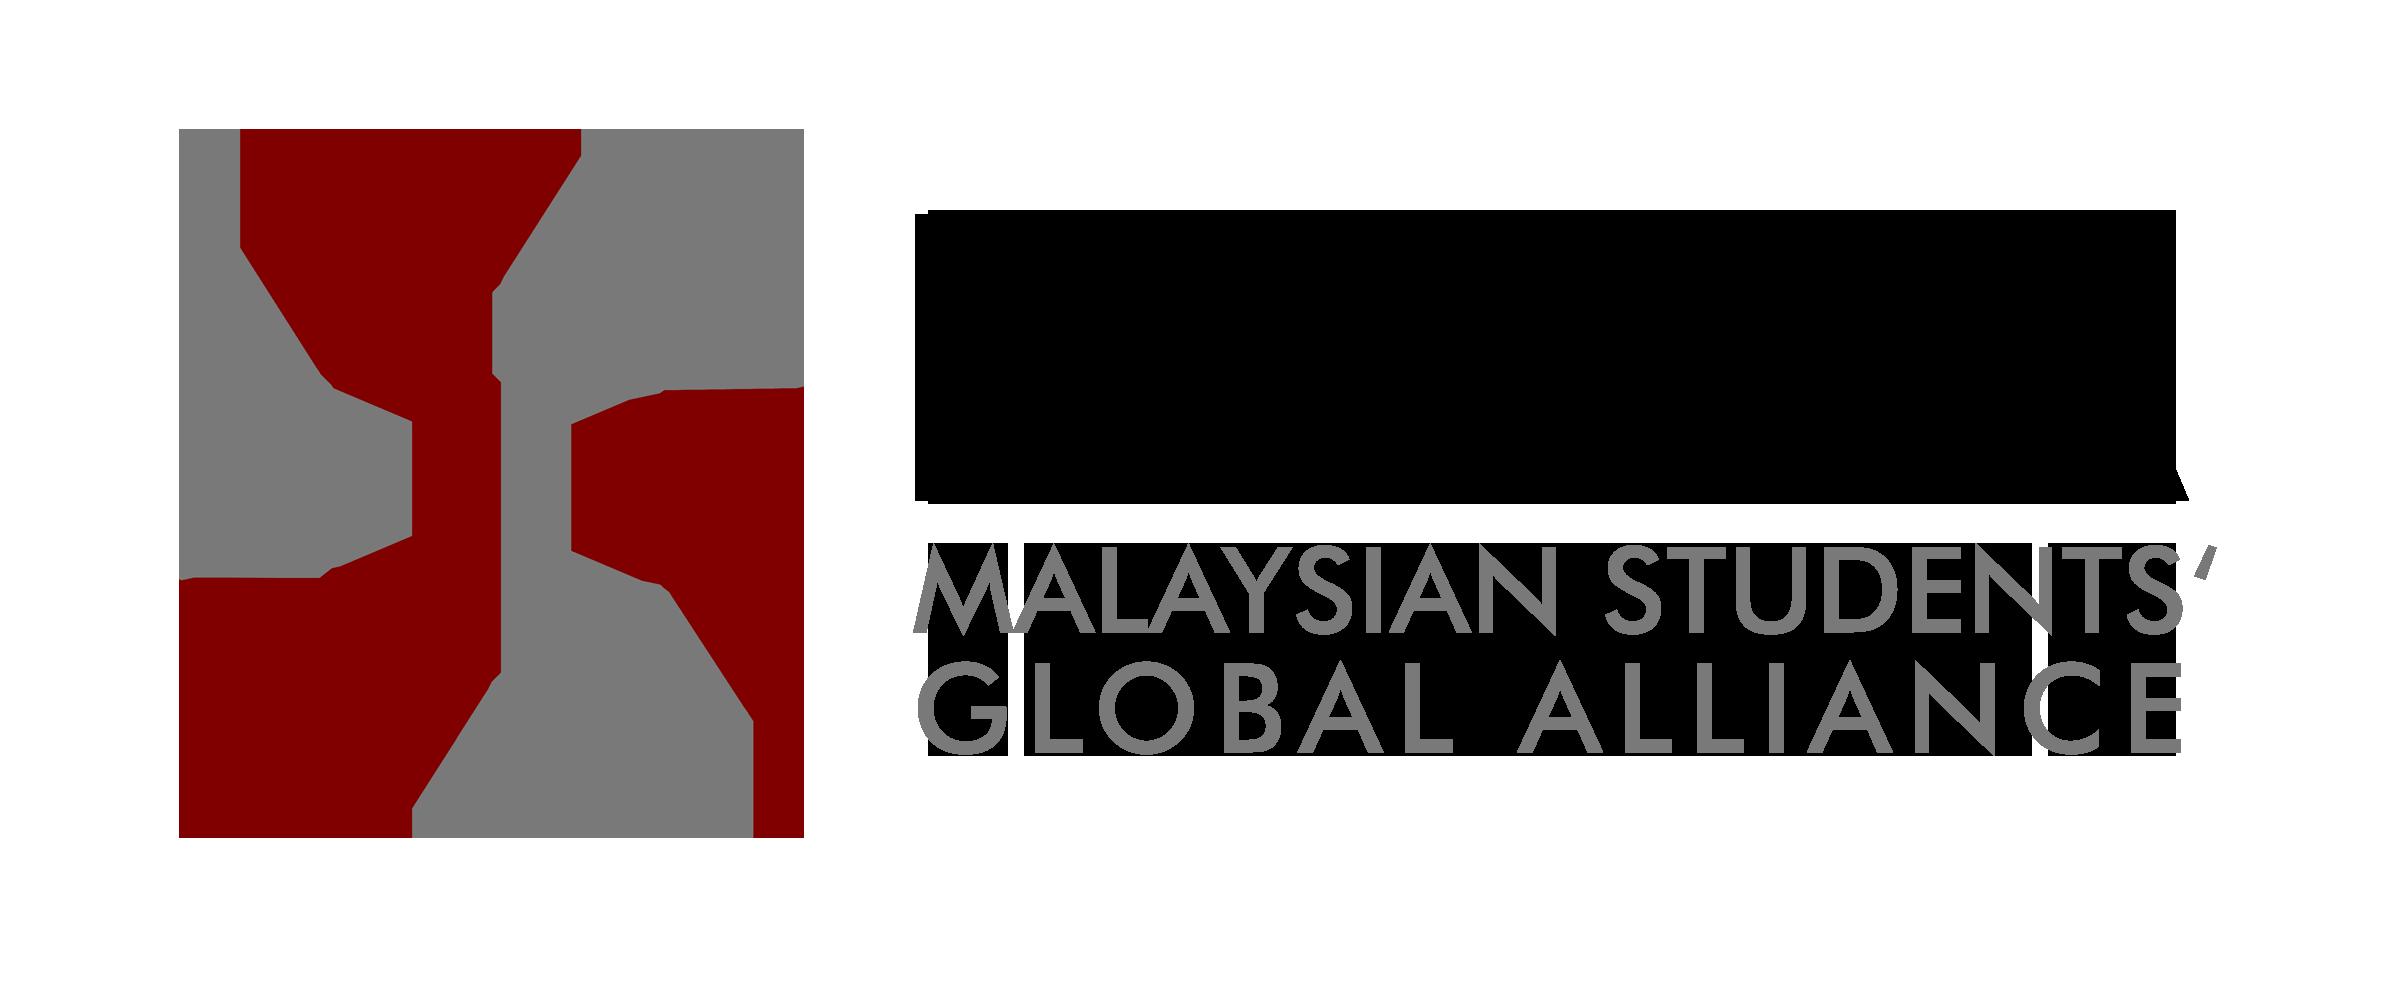 MSGA Minor Horizontal Primary Logo